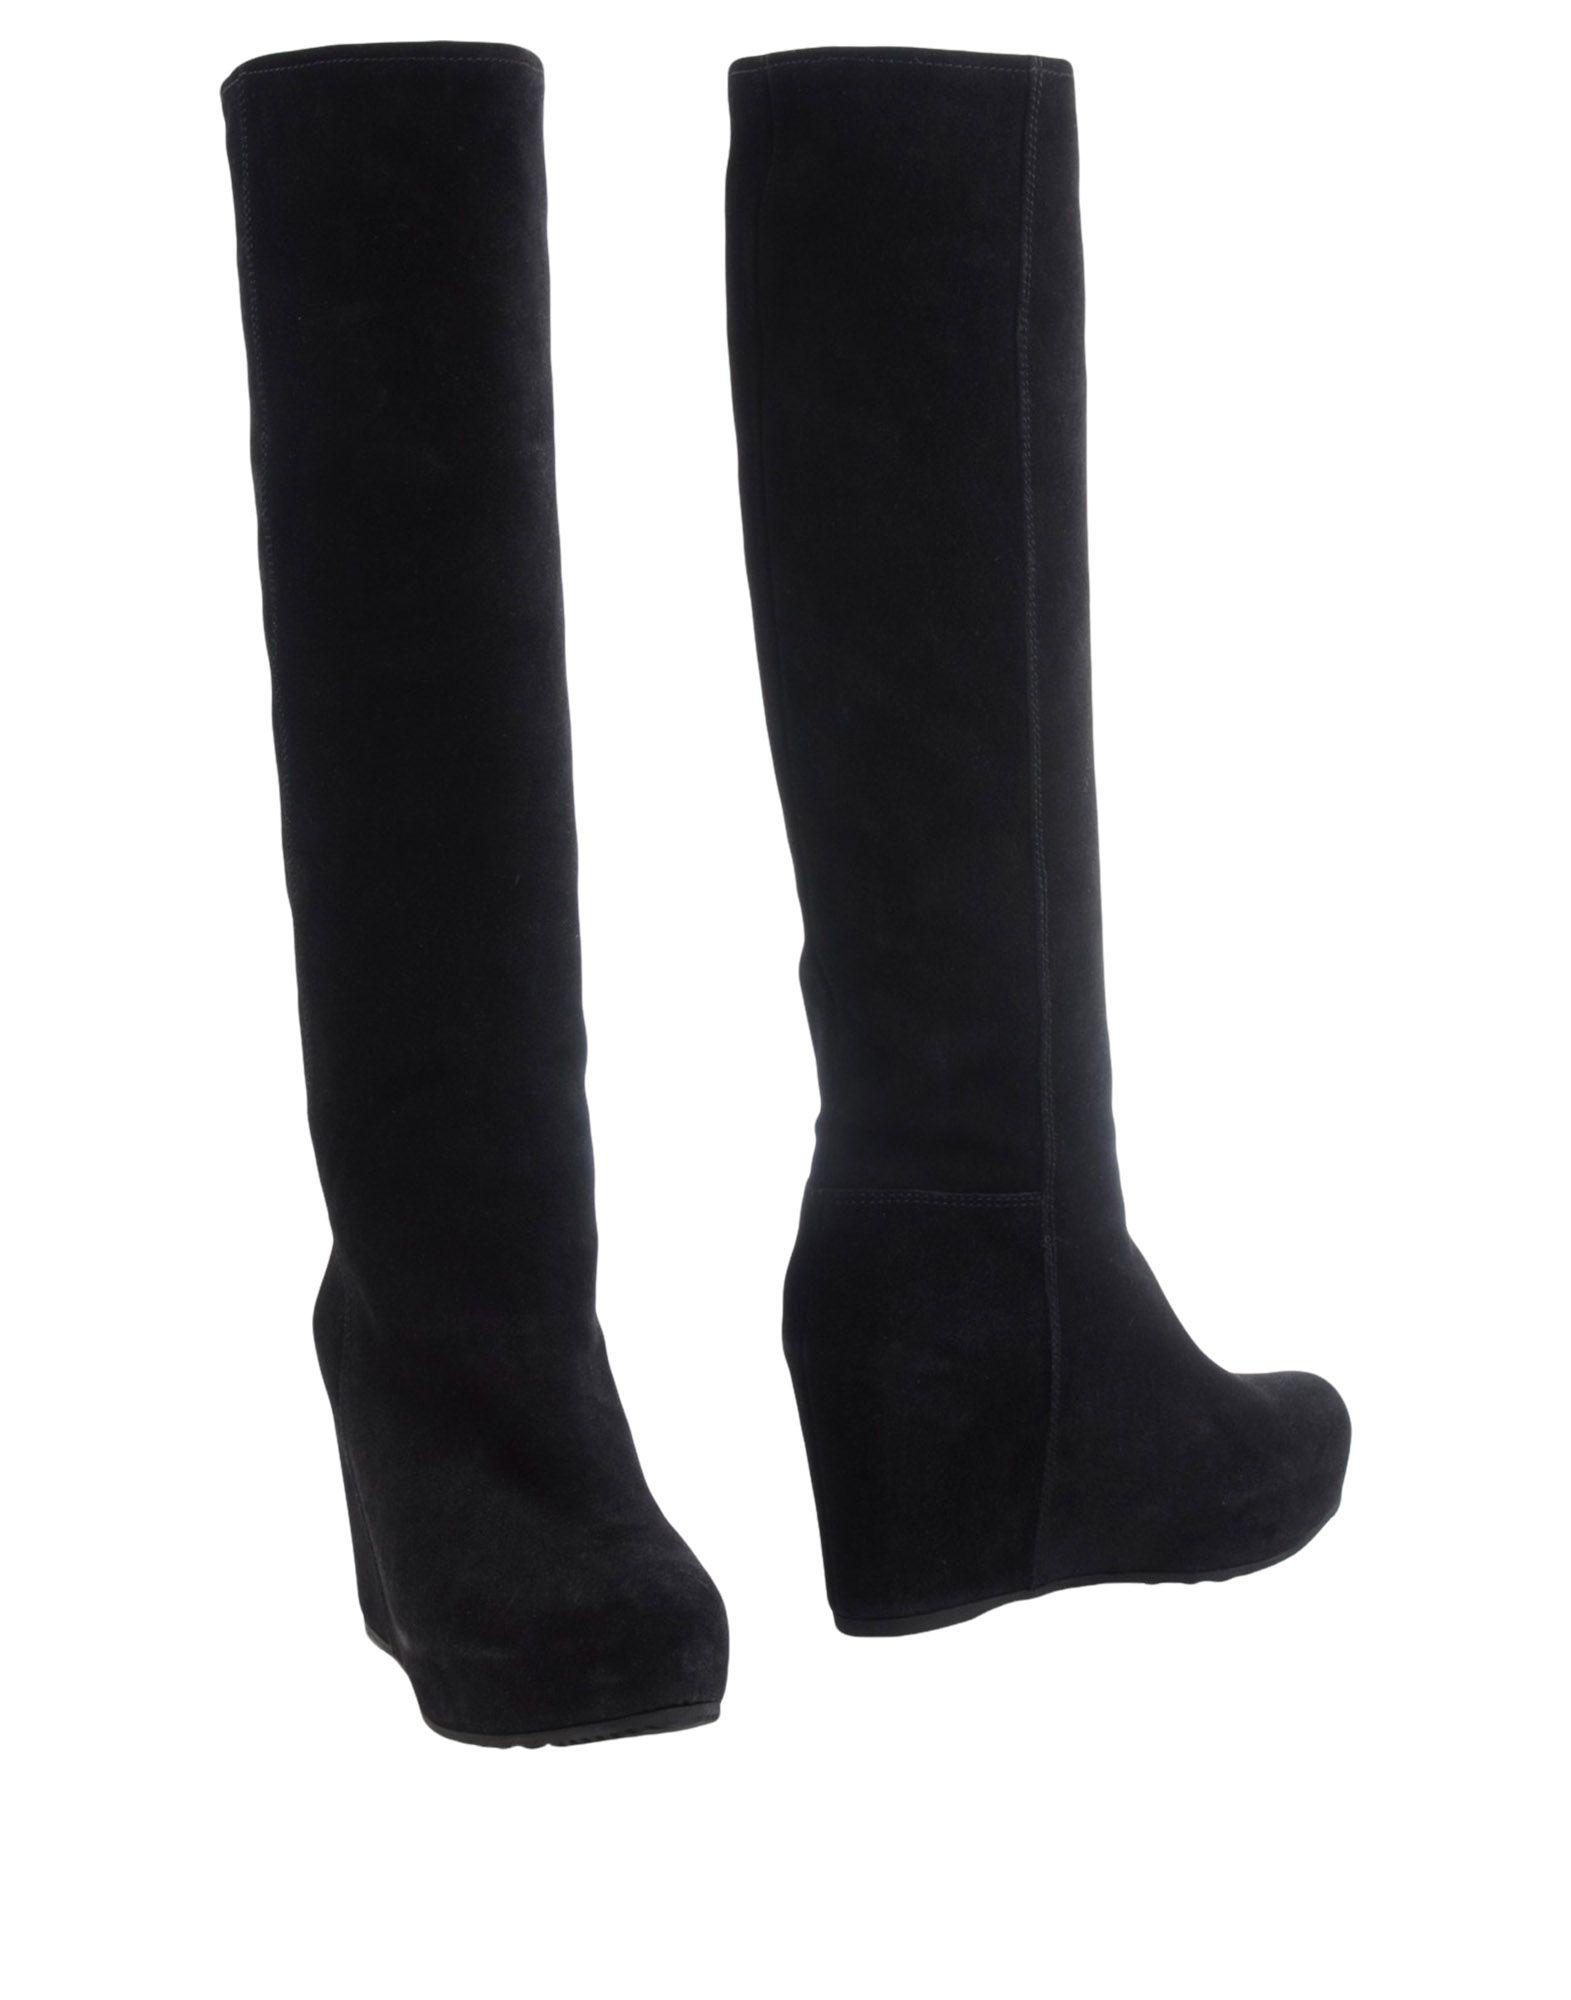 Carshoe Boots - Women Carshoe Australia Boots online on  Australia Carshoe - 11282000FM b517e2